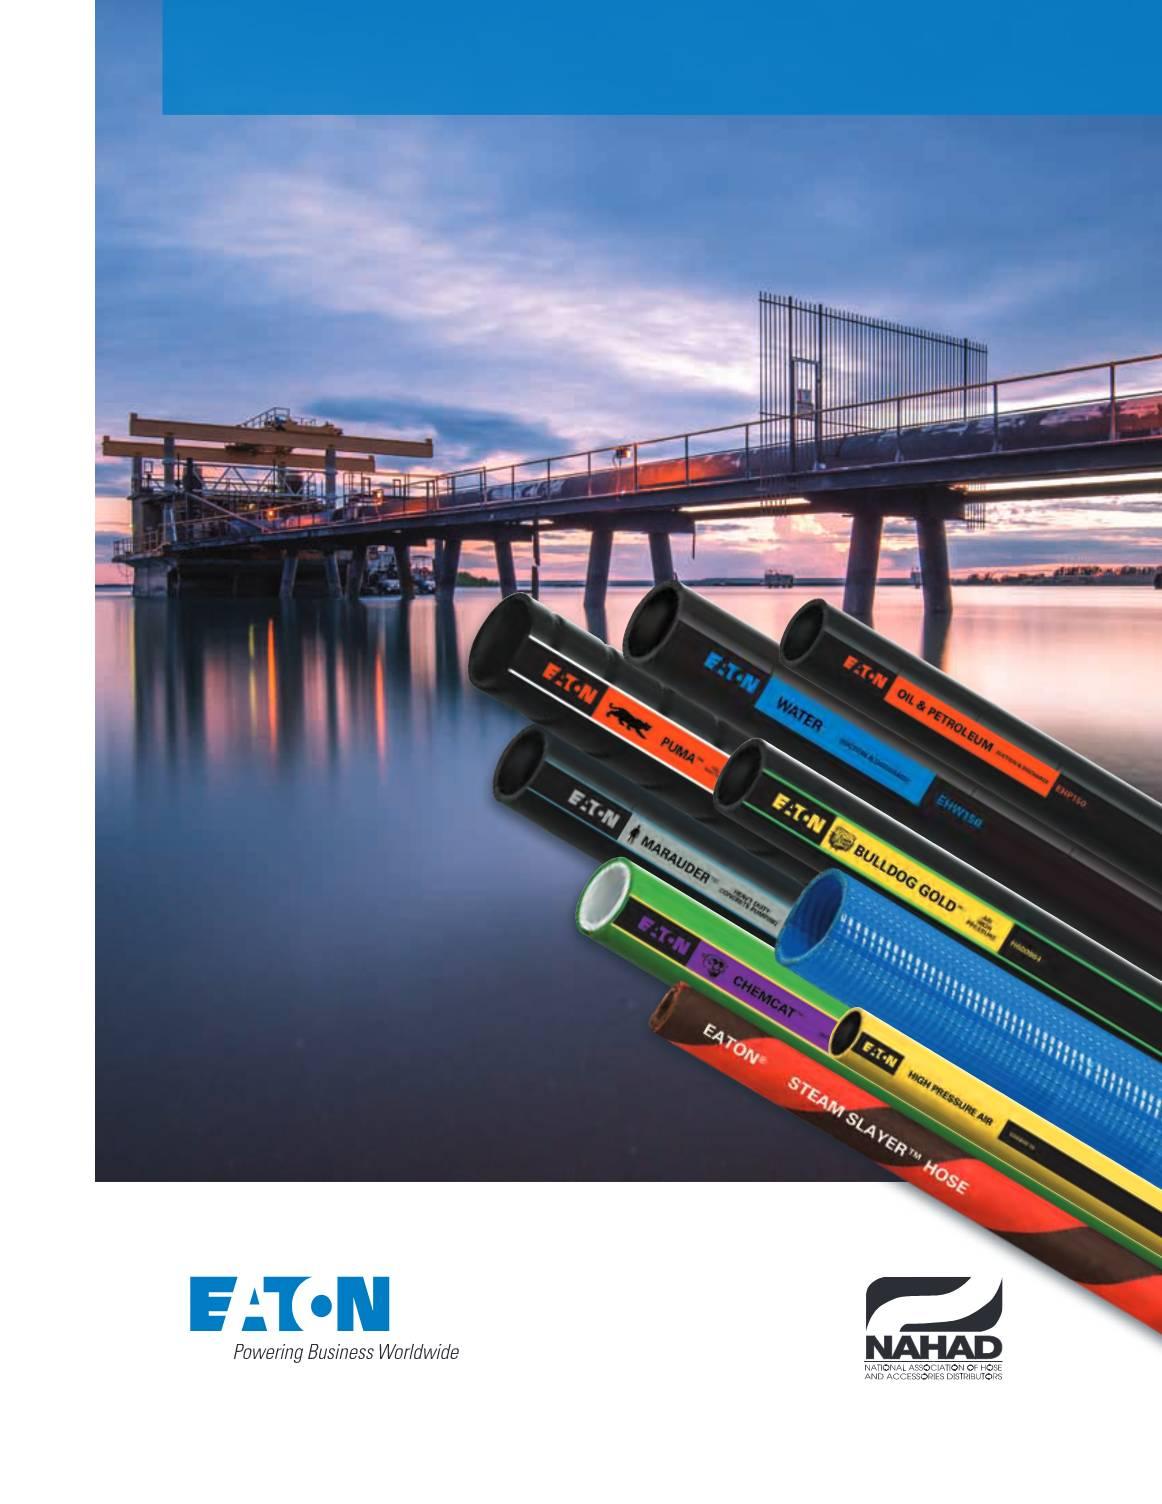 Boston Eaton Industrial Hose Catalog